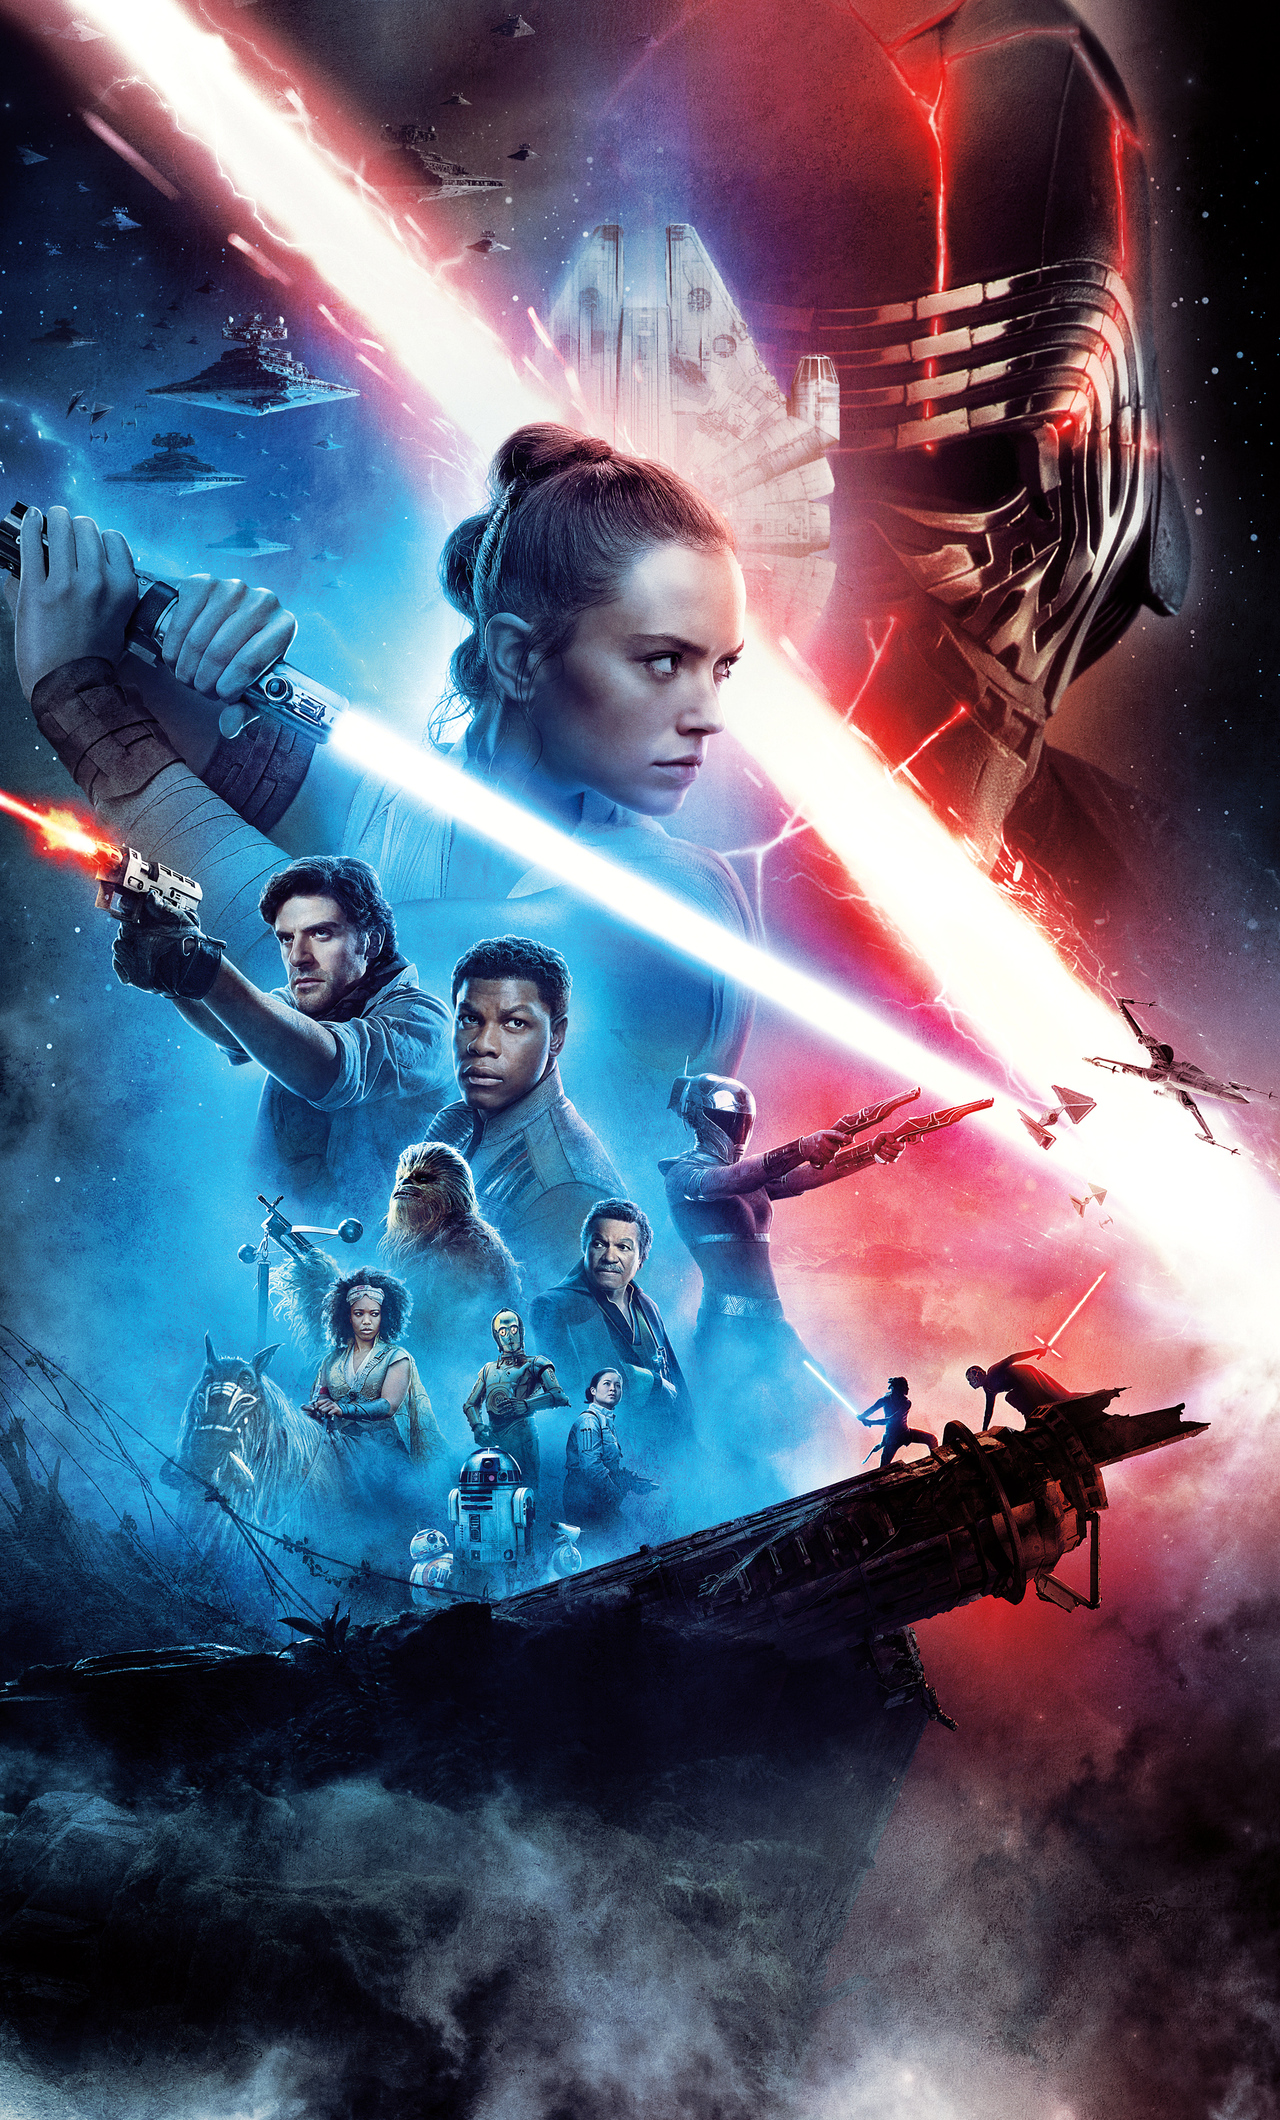 star-wars-the-rise-of-skywalker-8k-qh.jpg